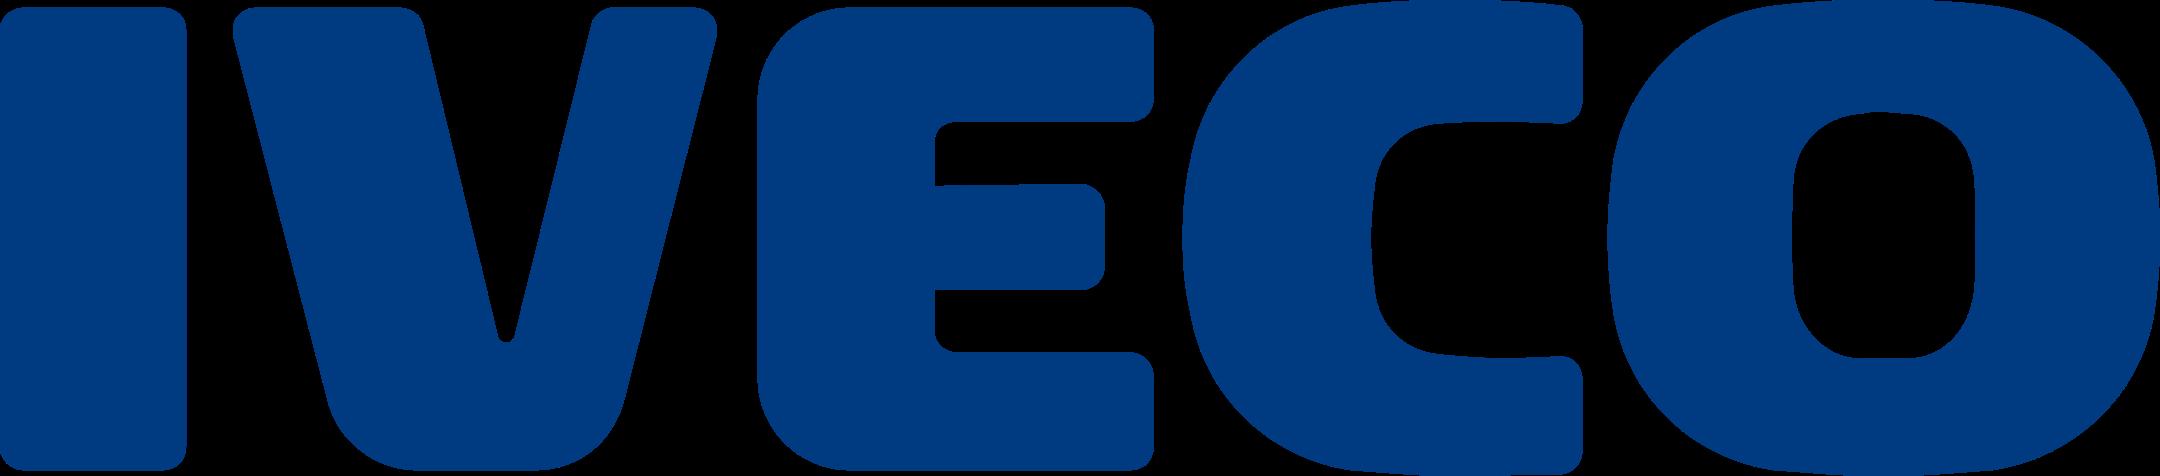 iveco logo 1 1 - Iveco Logo